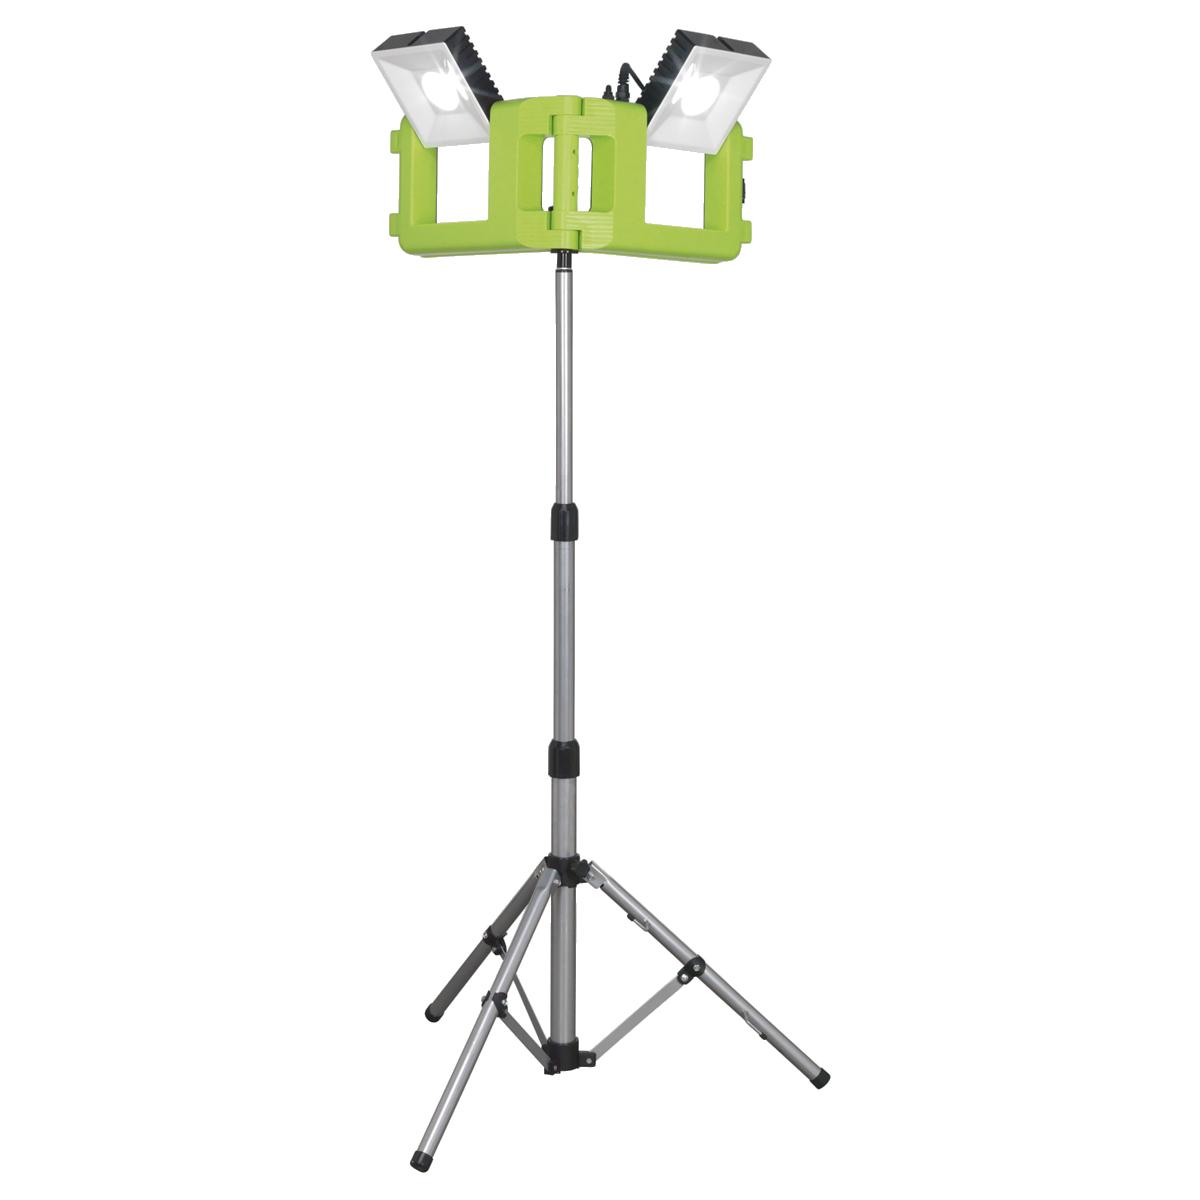 Floodlight 60W Folding Case & Stand